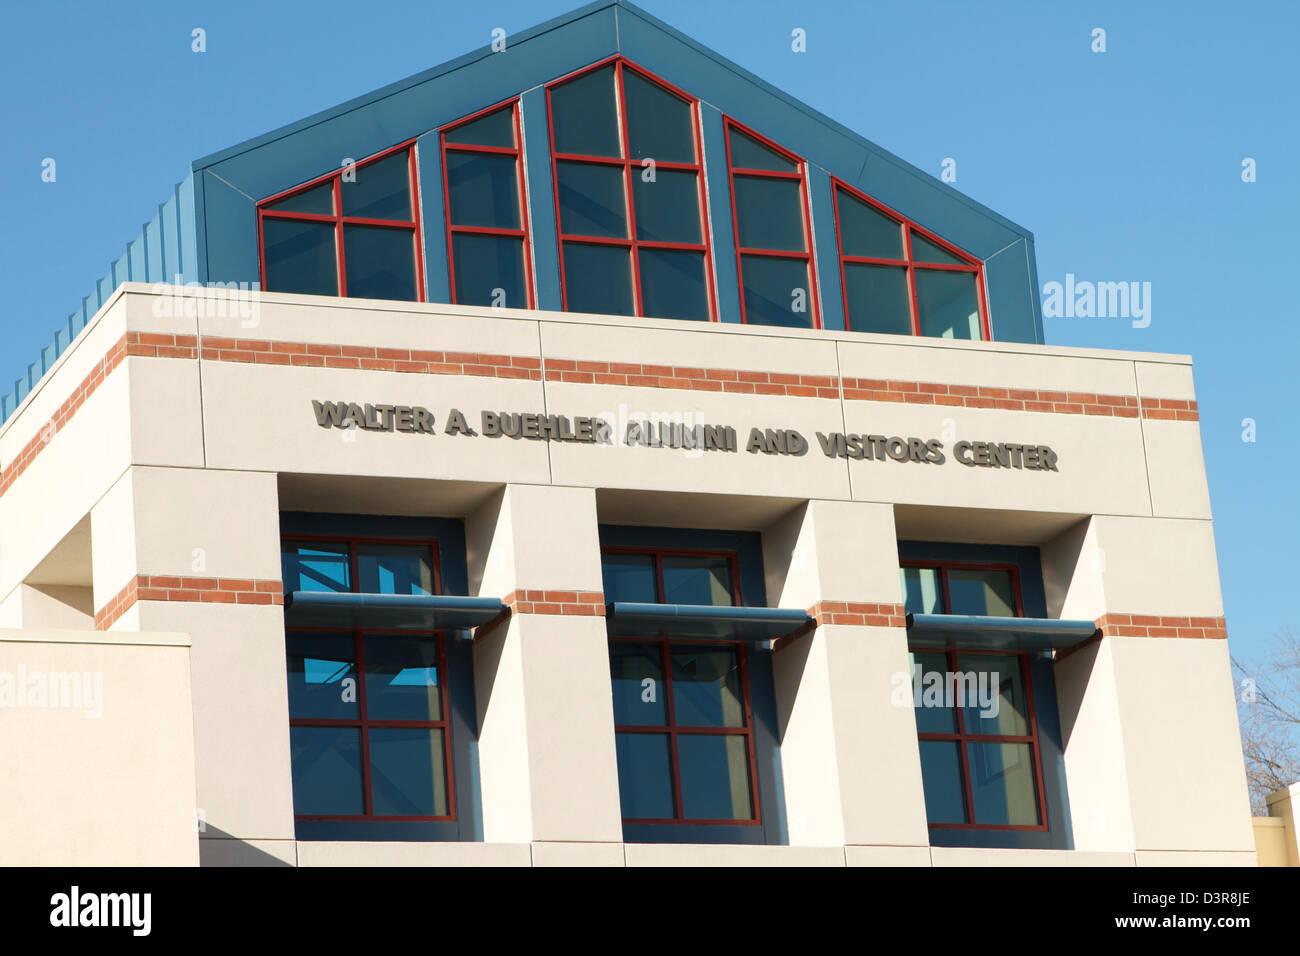 The Walter A Buehler Alumni and Visitors Center at the University of California Davis (UC Davis) Stock Photo